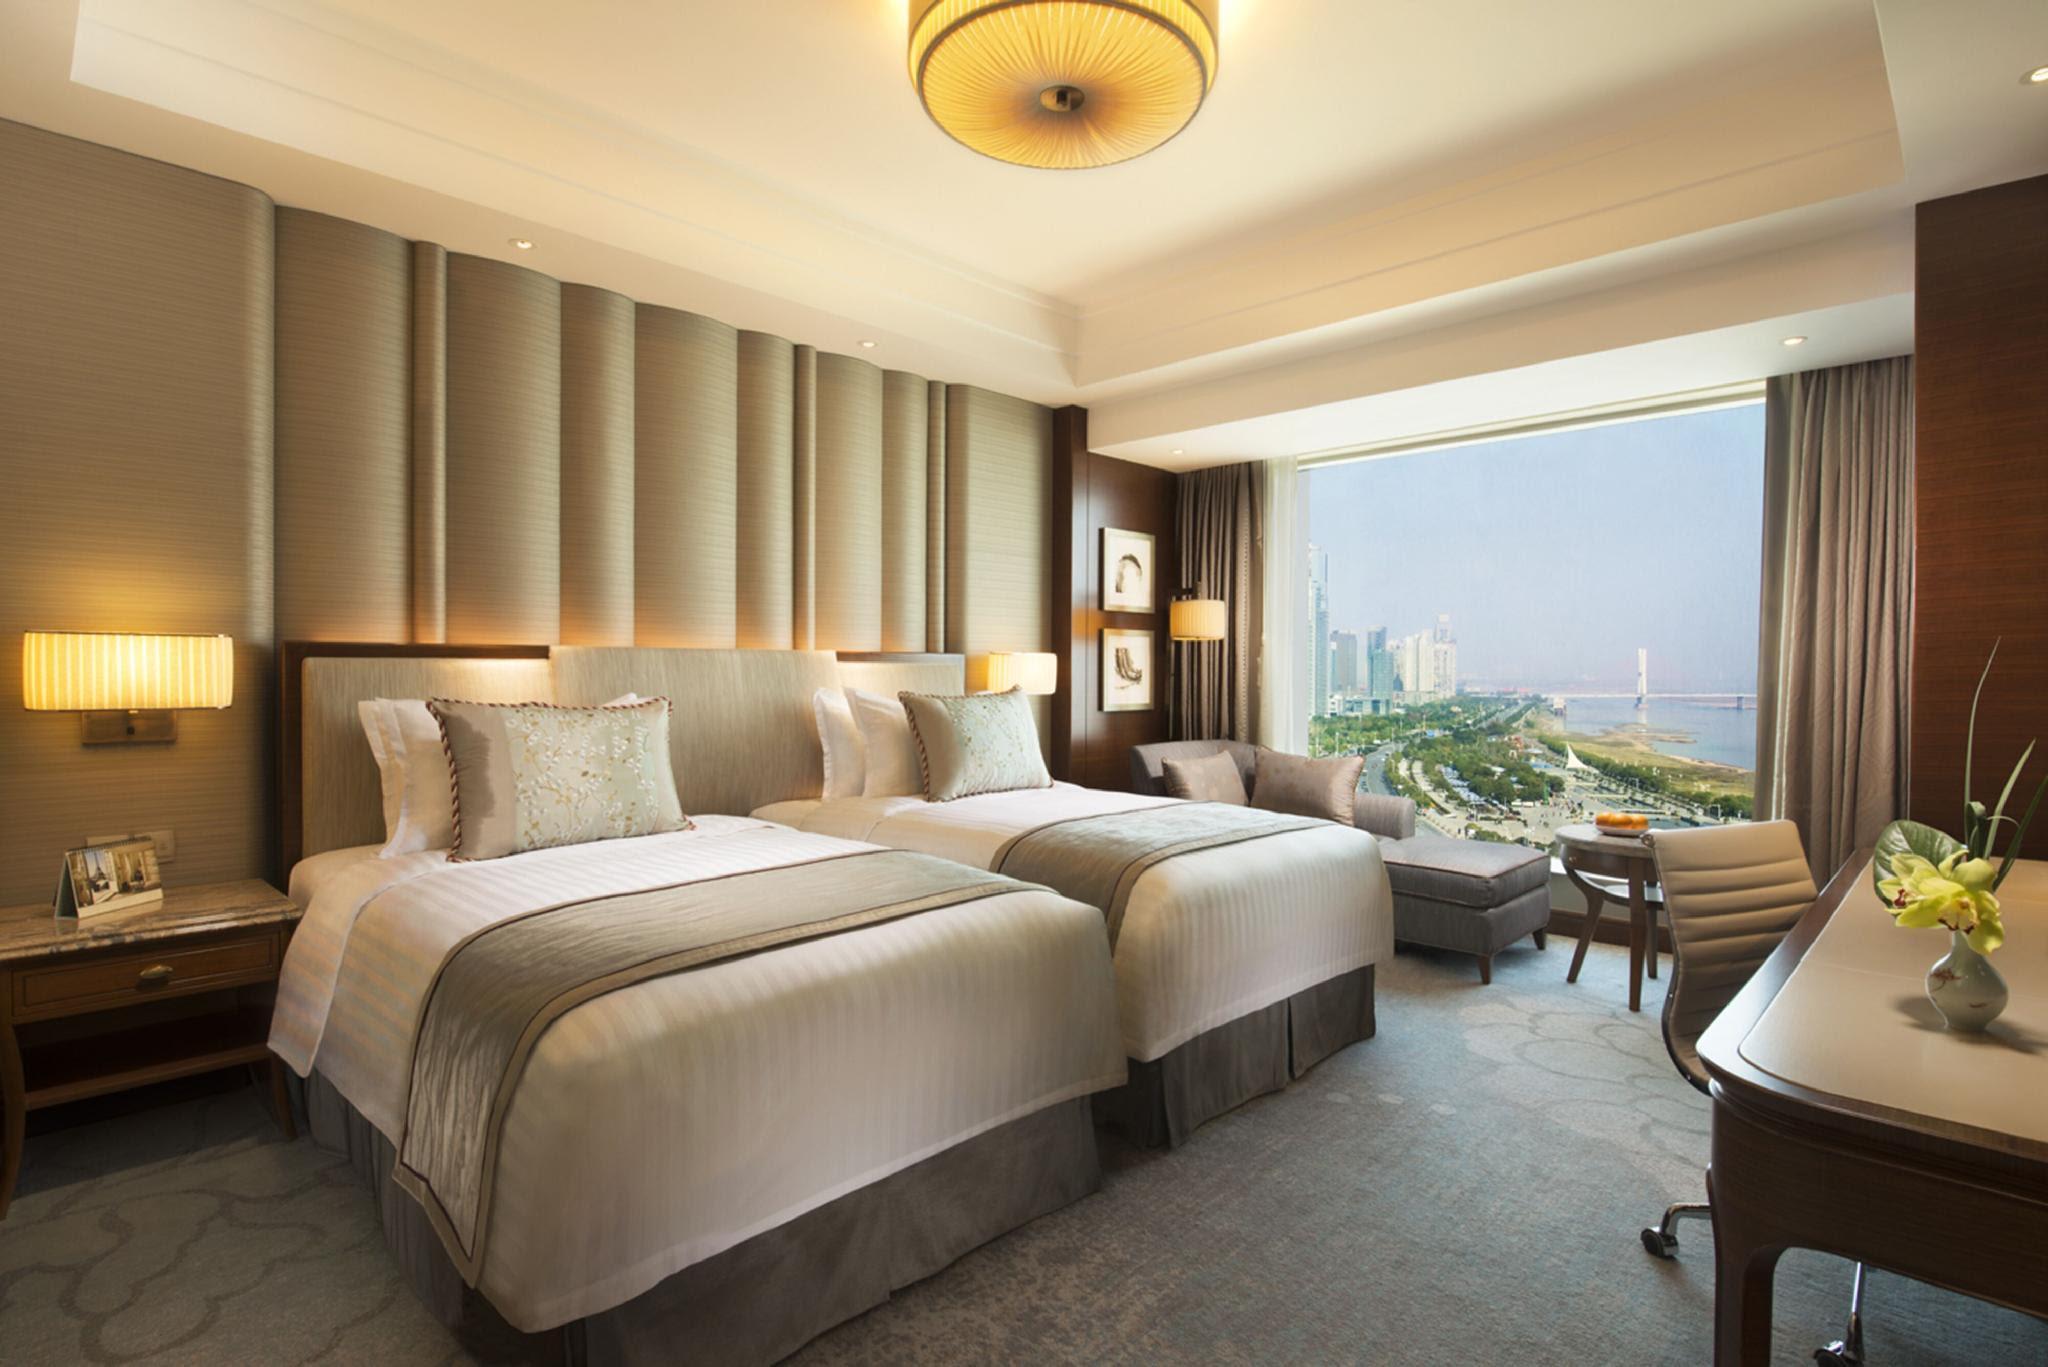 Shangri-La Hotel Nanchang Reviews